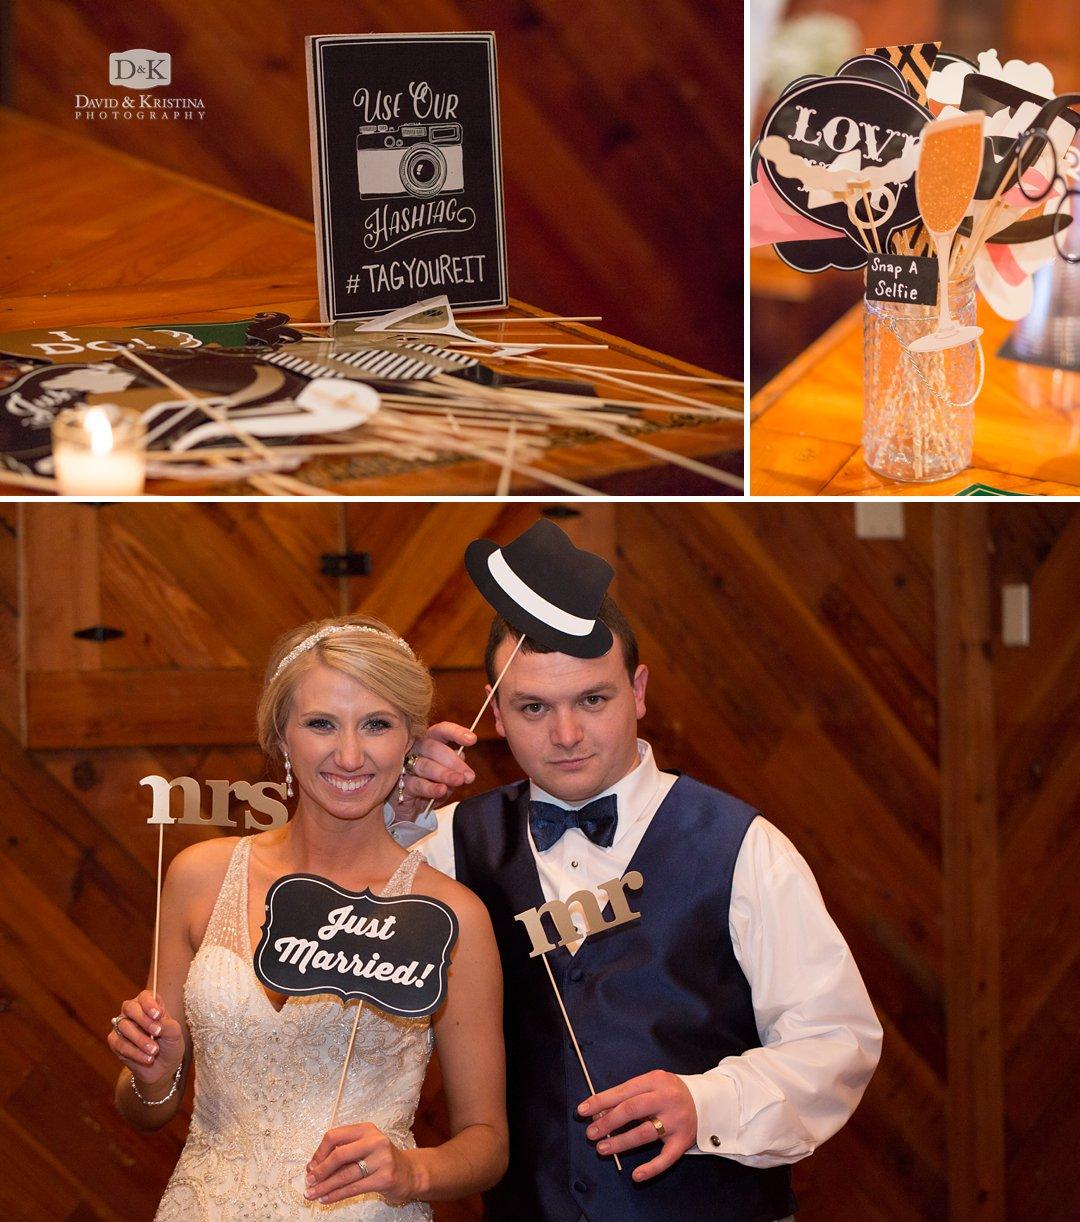 selfie station at wedding reception